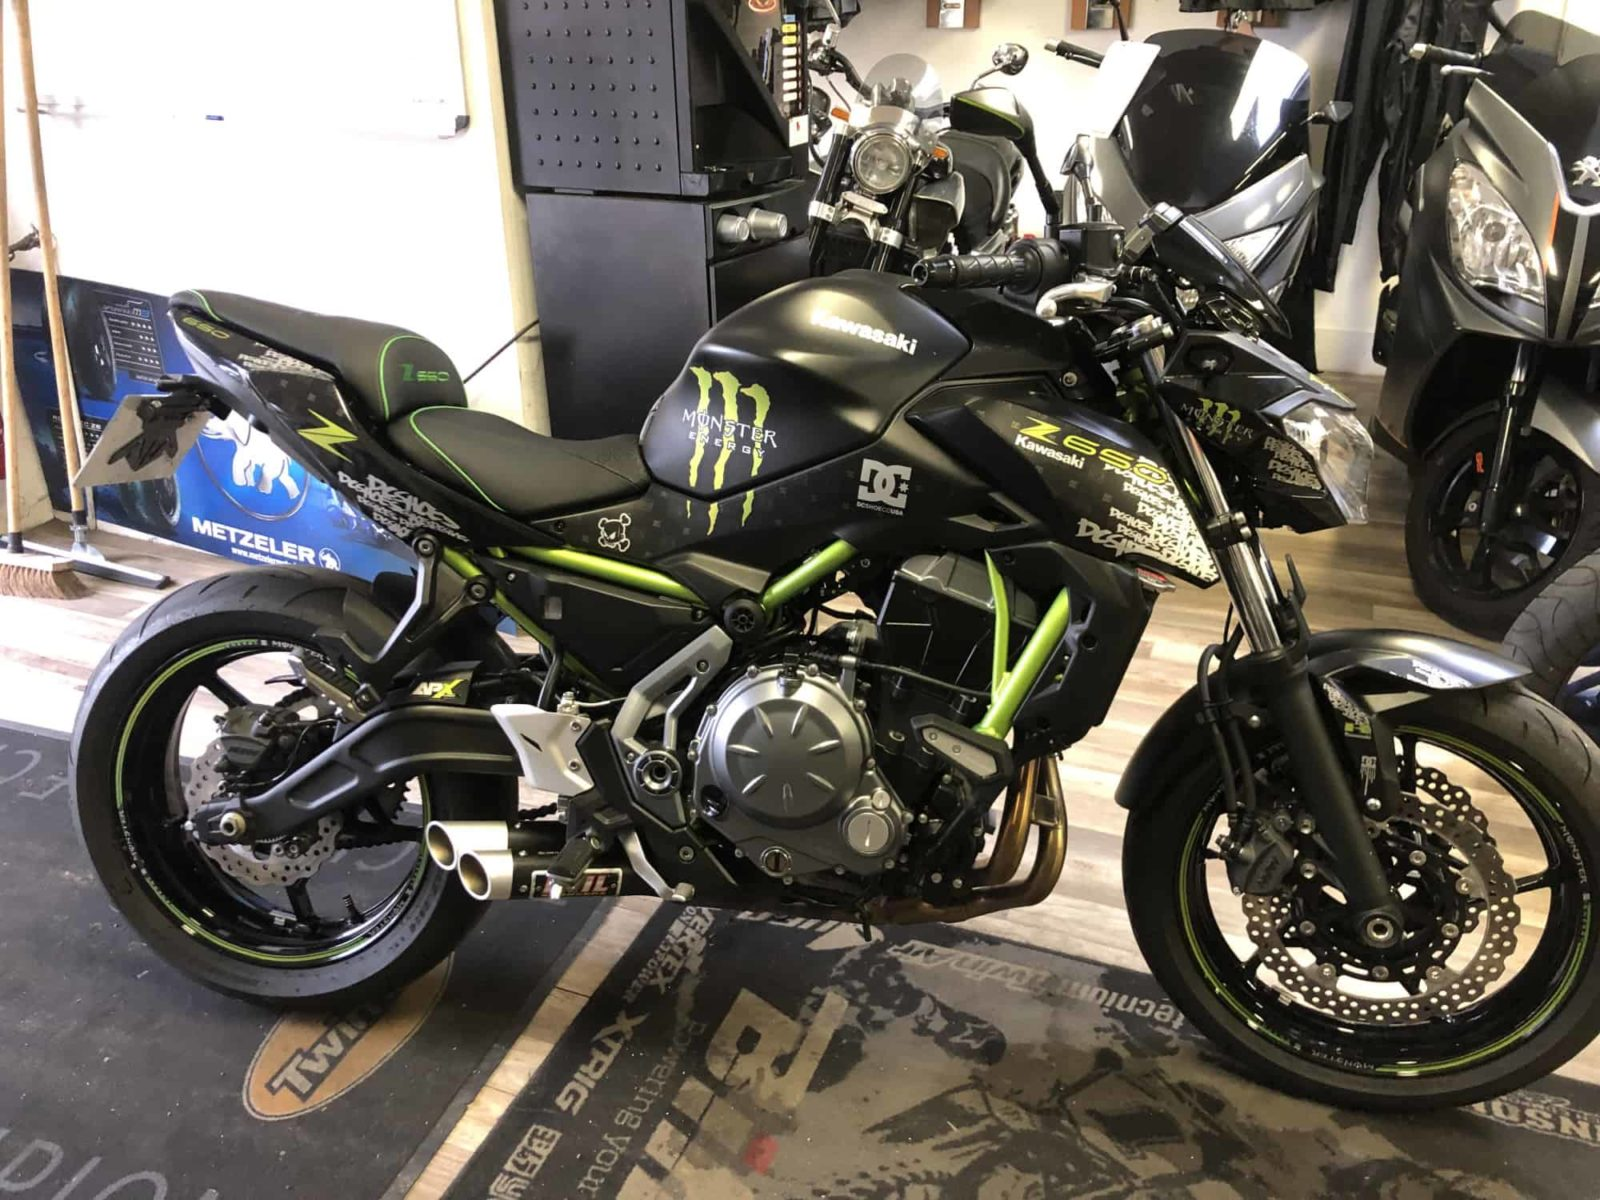 Vendu ! Kawasaki Z650 – 6700€